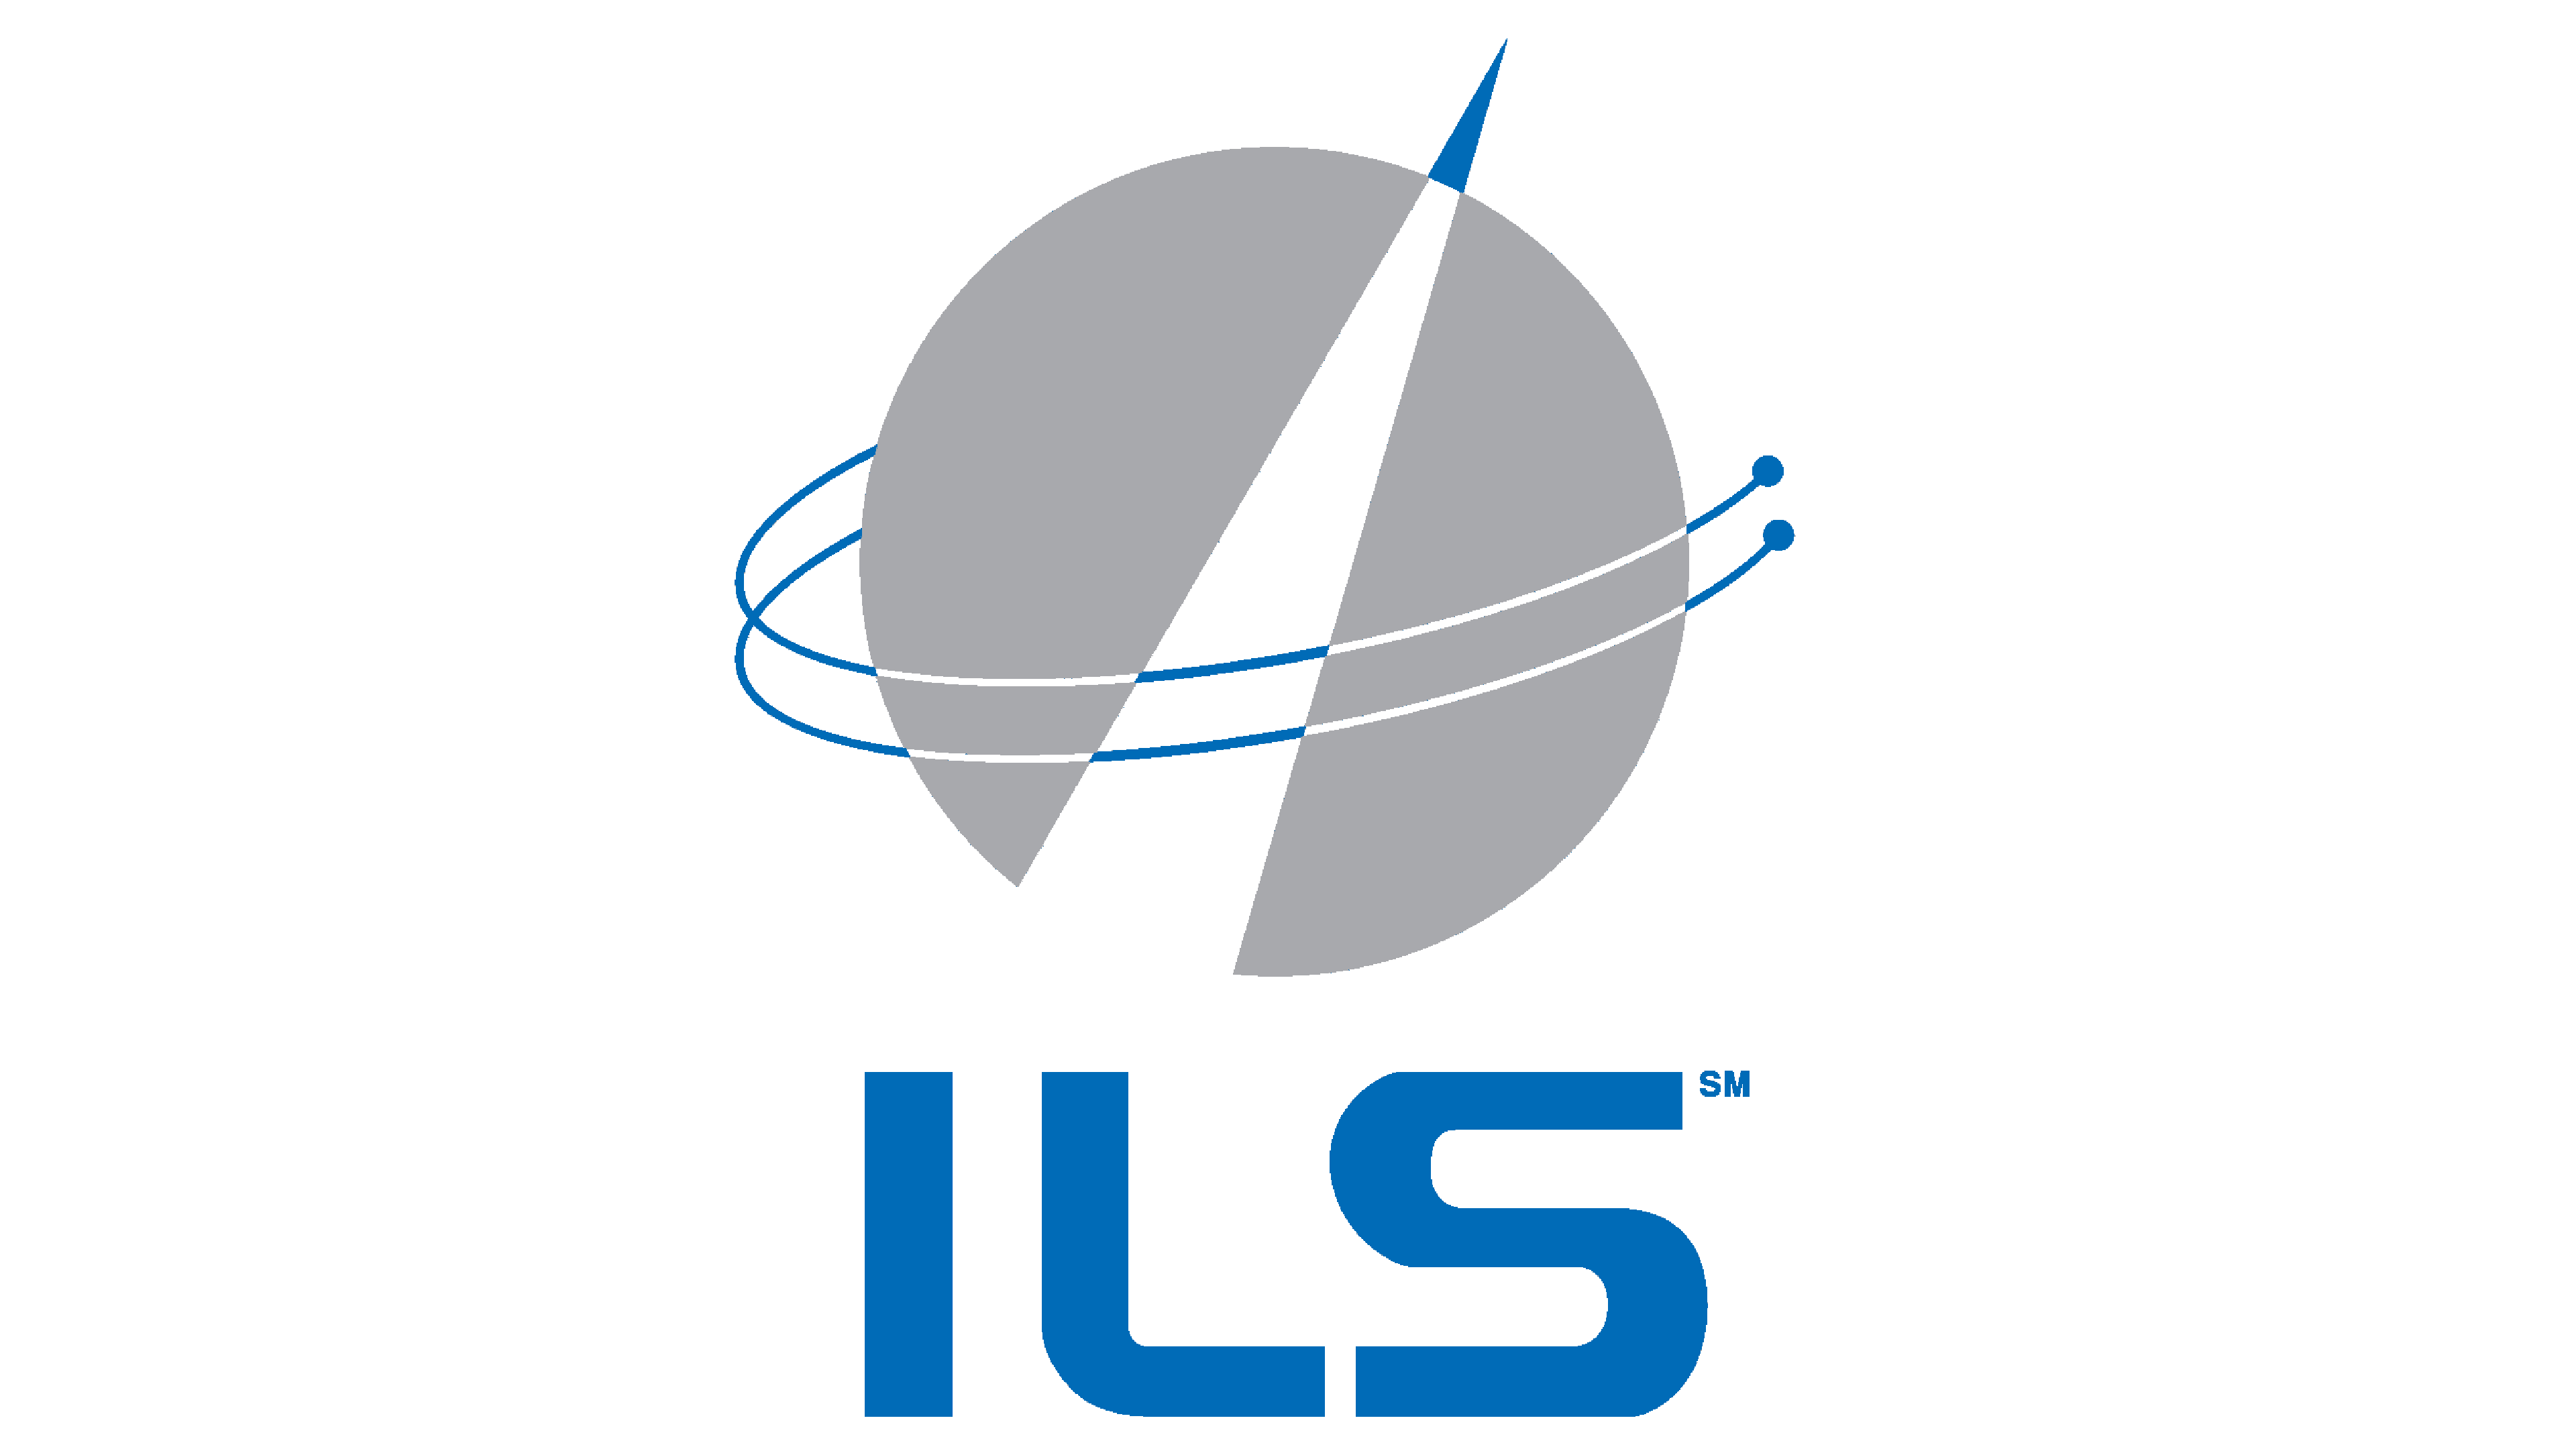 International Launch Services Logo Logo